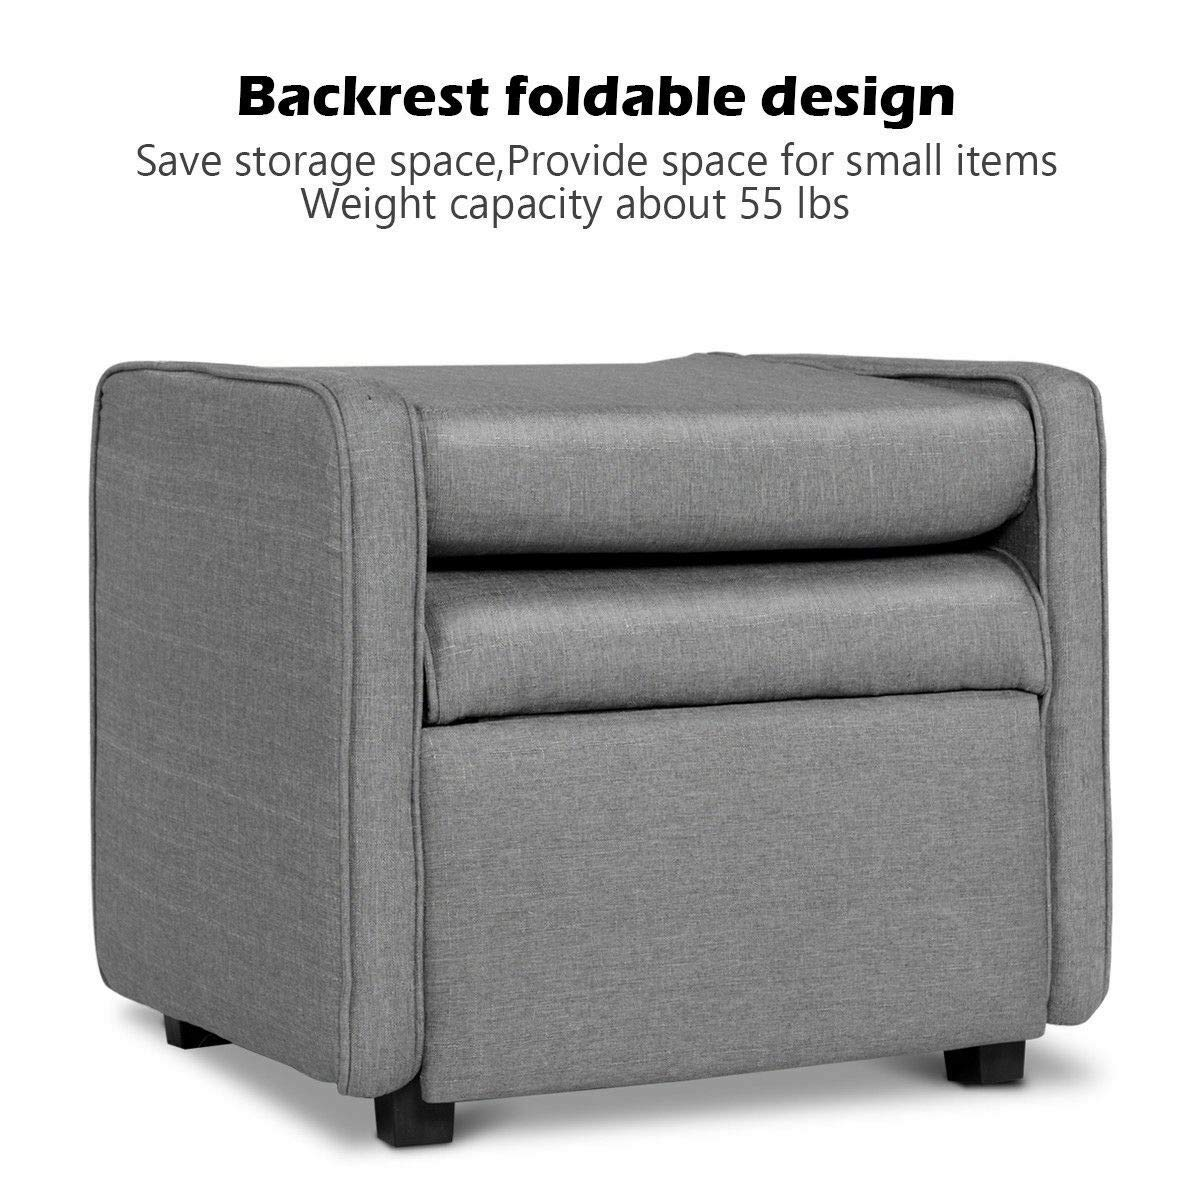 Amazon.com: Adumly - Sillón de sofá individual, plegable ...